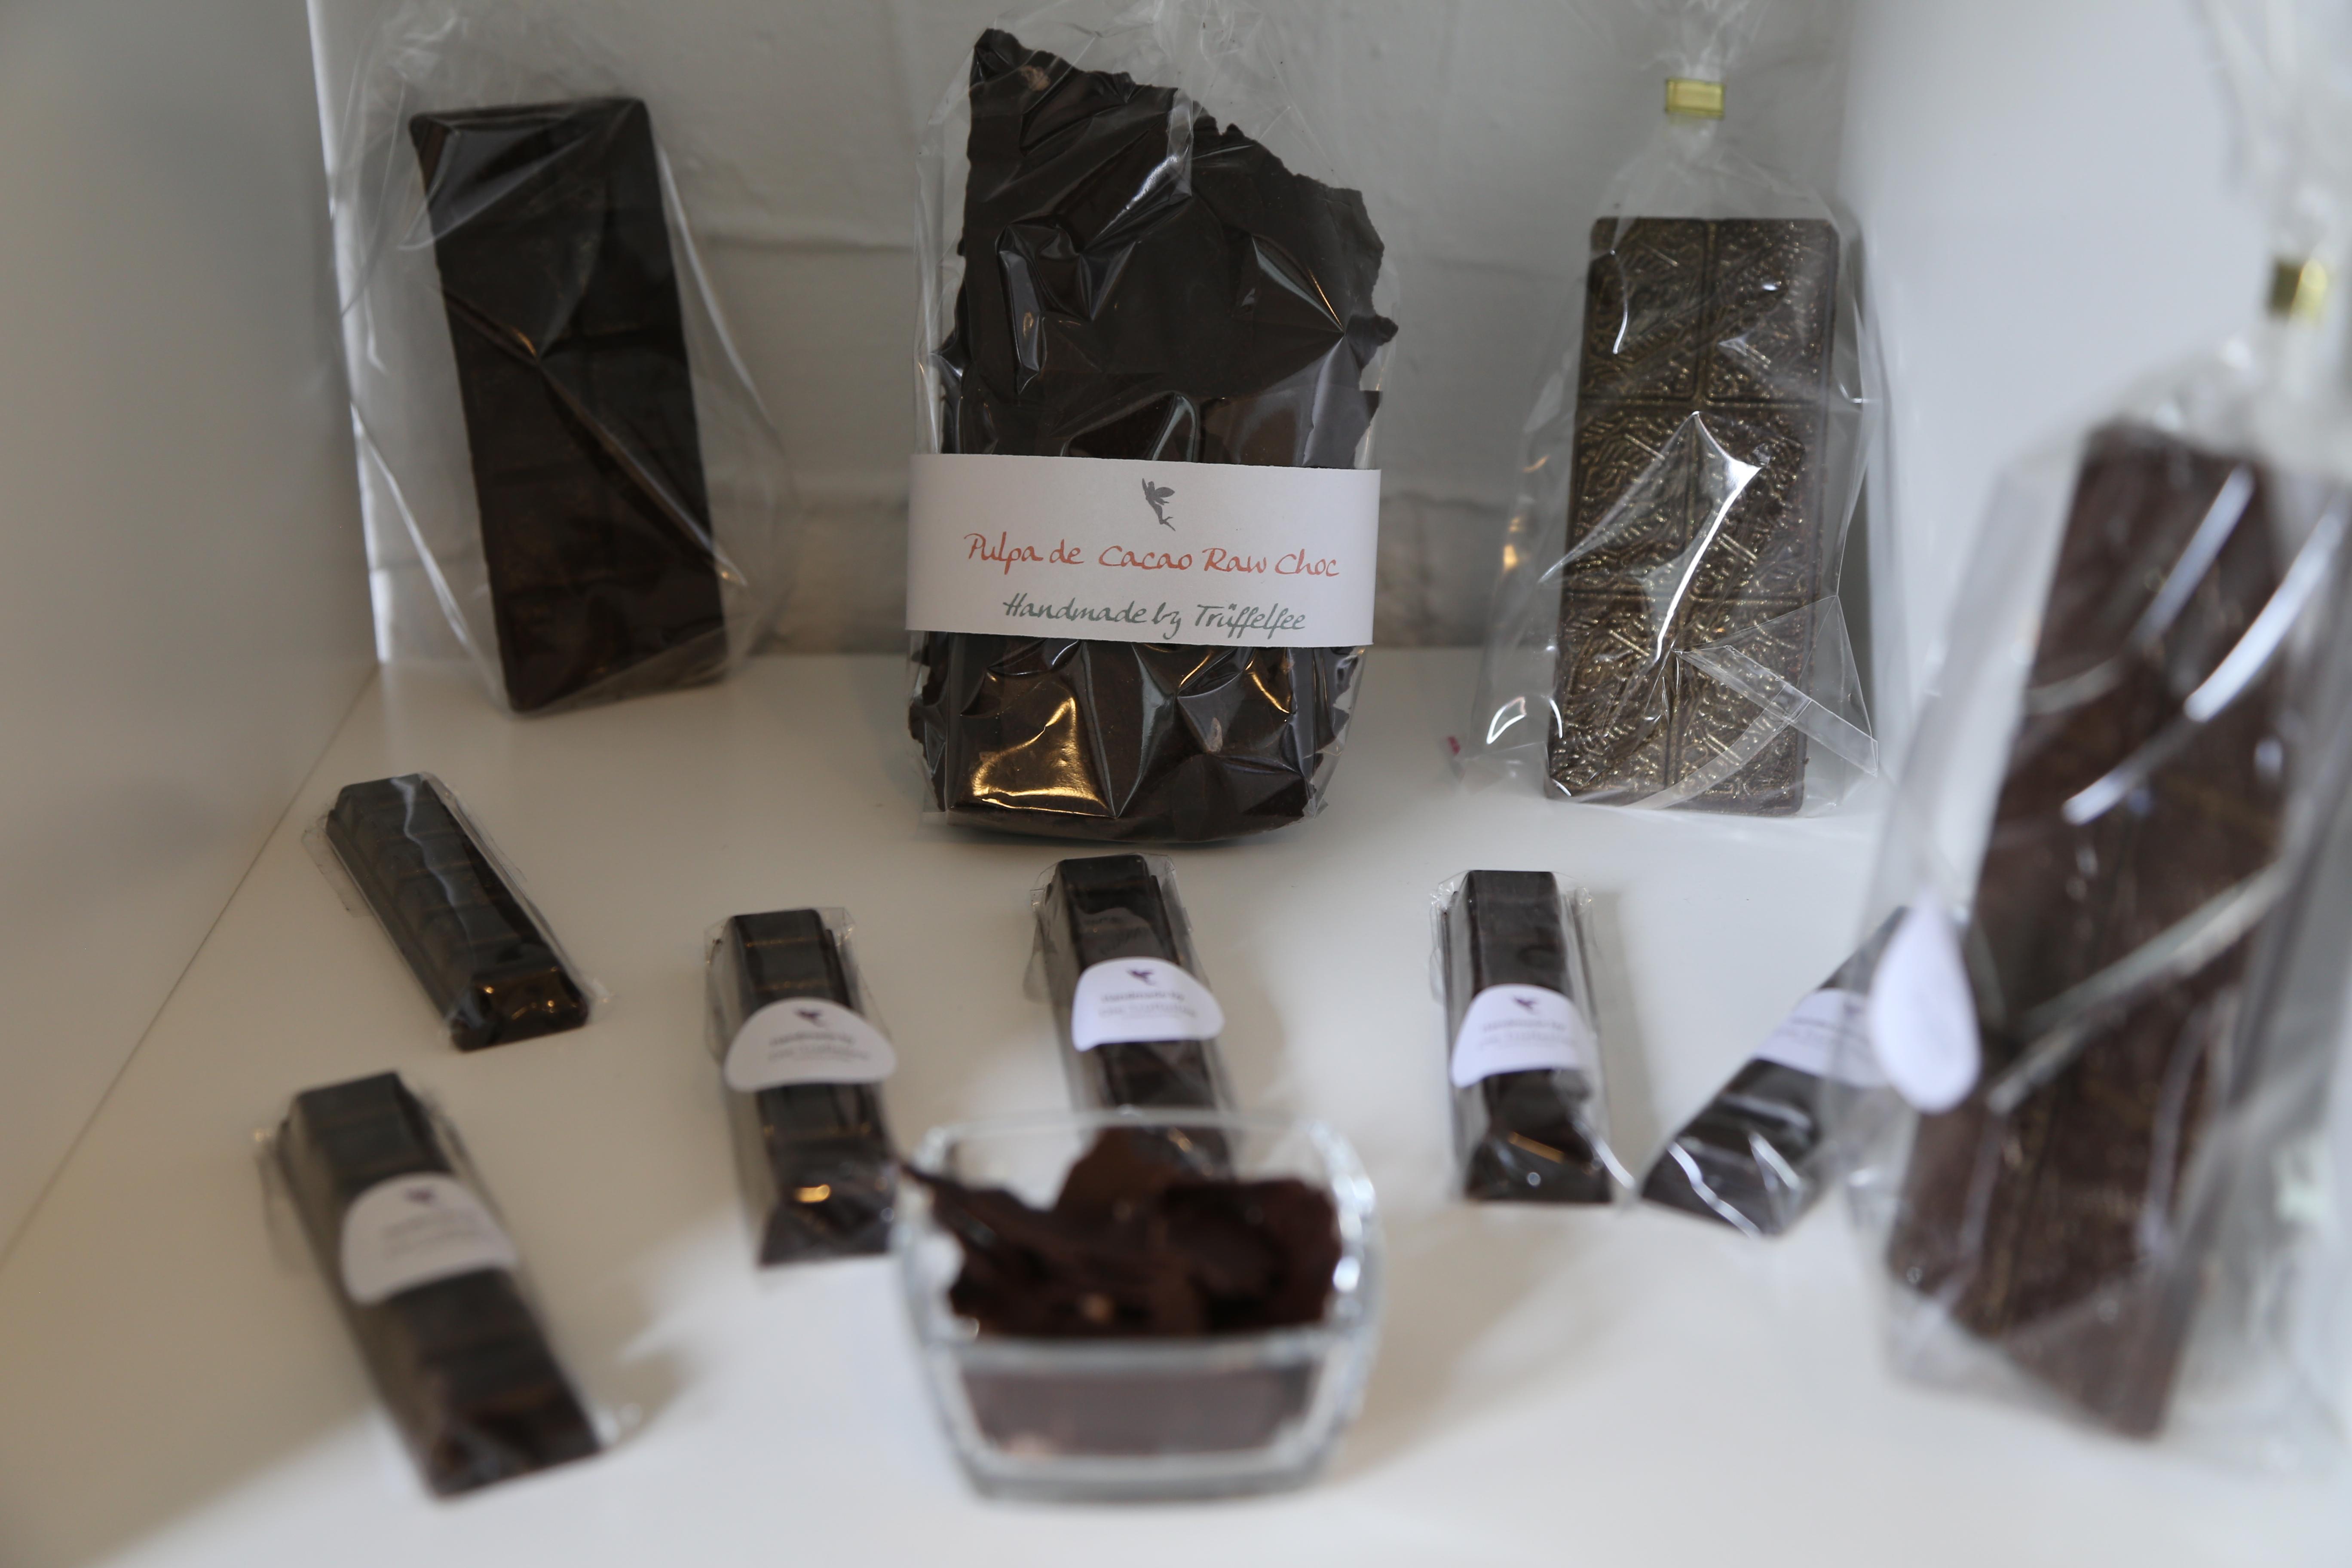 Rohschokolade